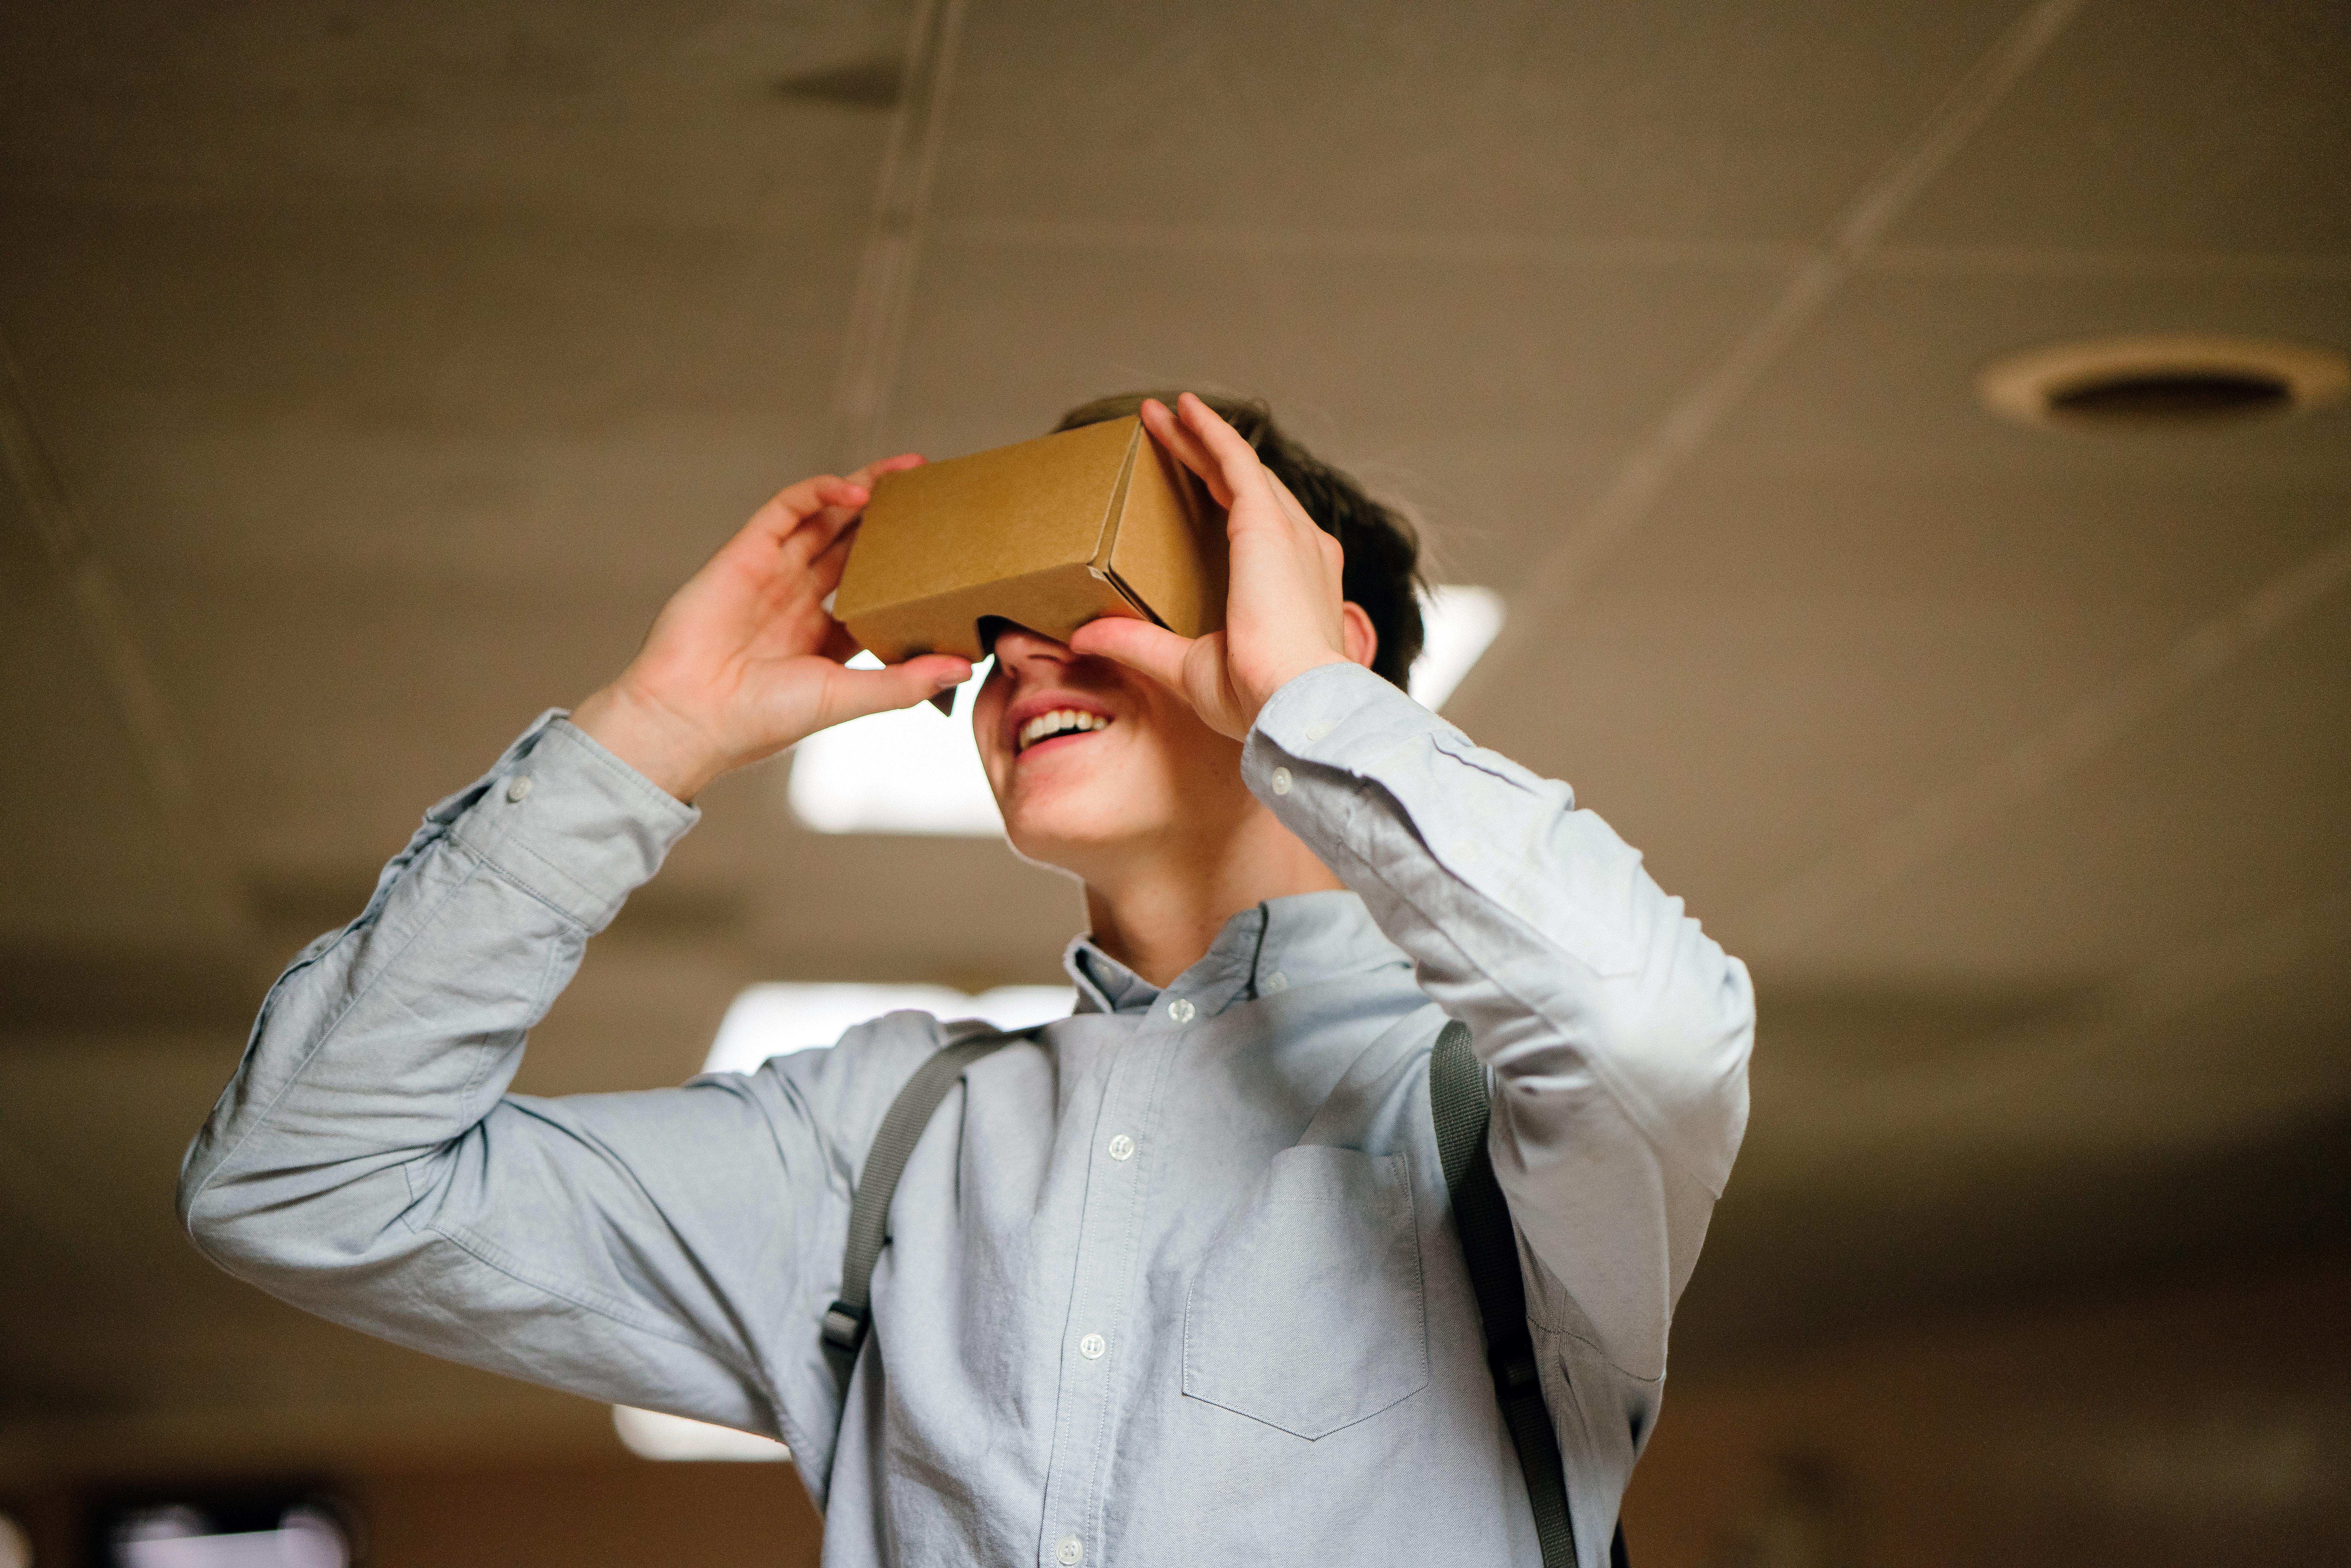 Cardboard to experience Virtual Reality